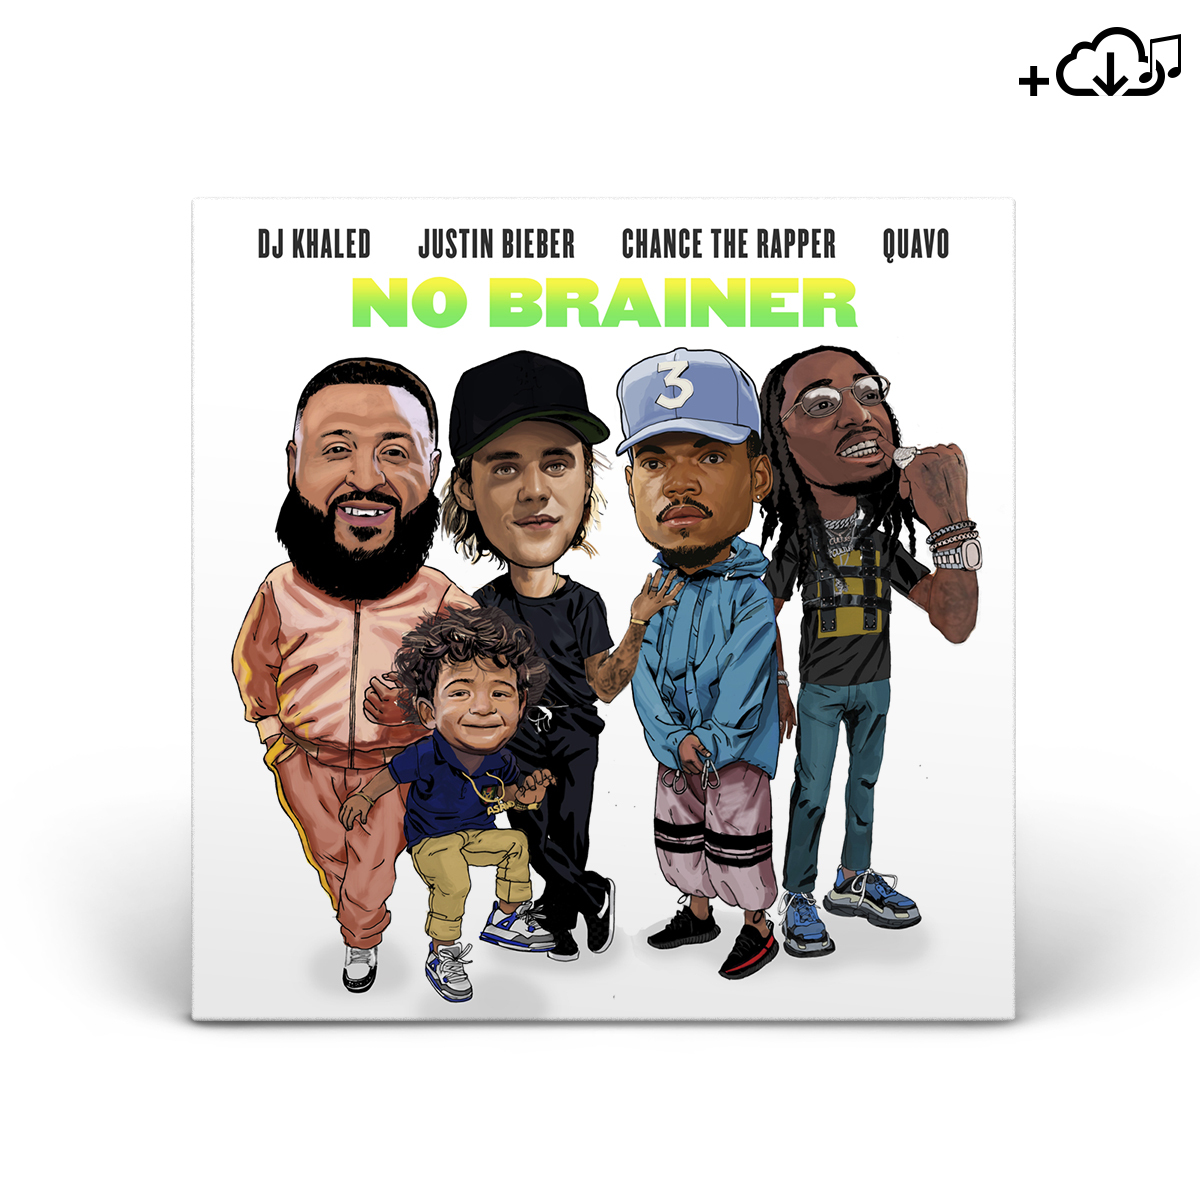 DJ Khaled - No Brainer Single Featuring Justin Bieber, Quavo & Chance The Rapper